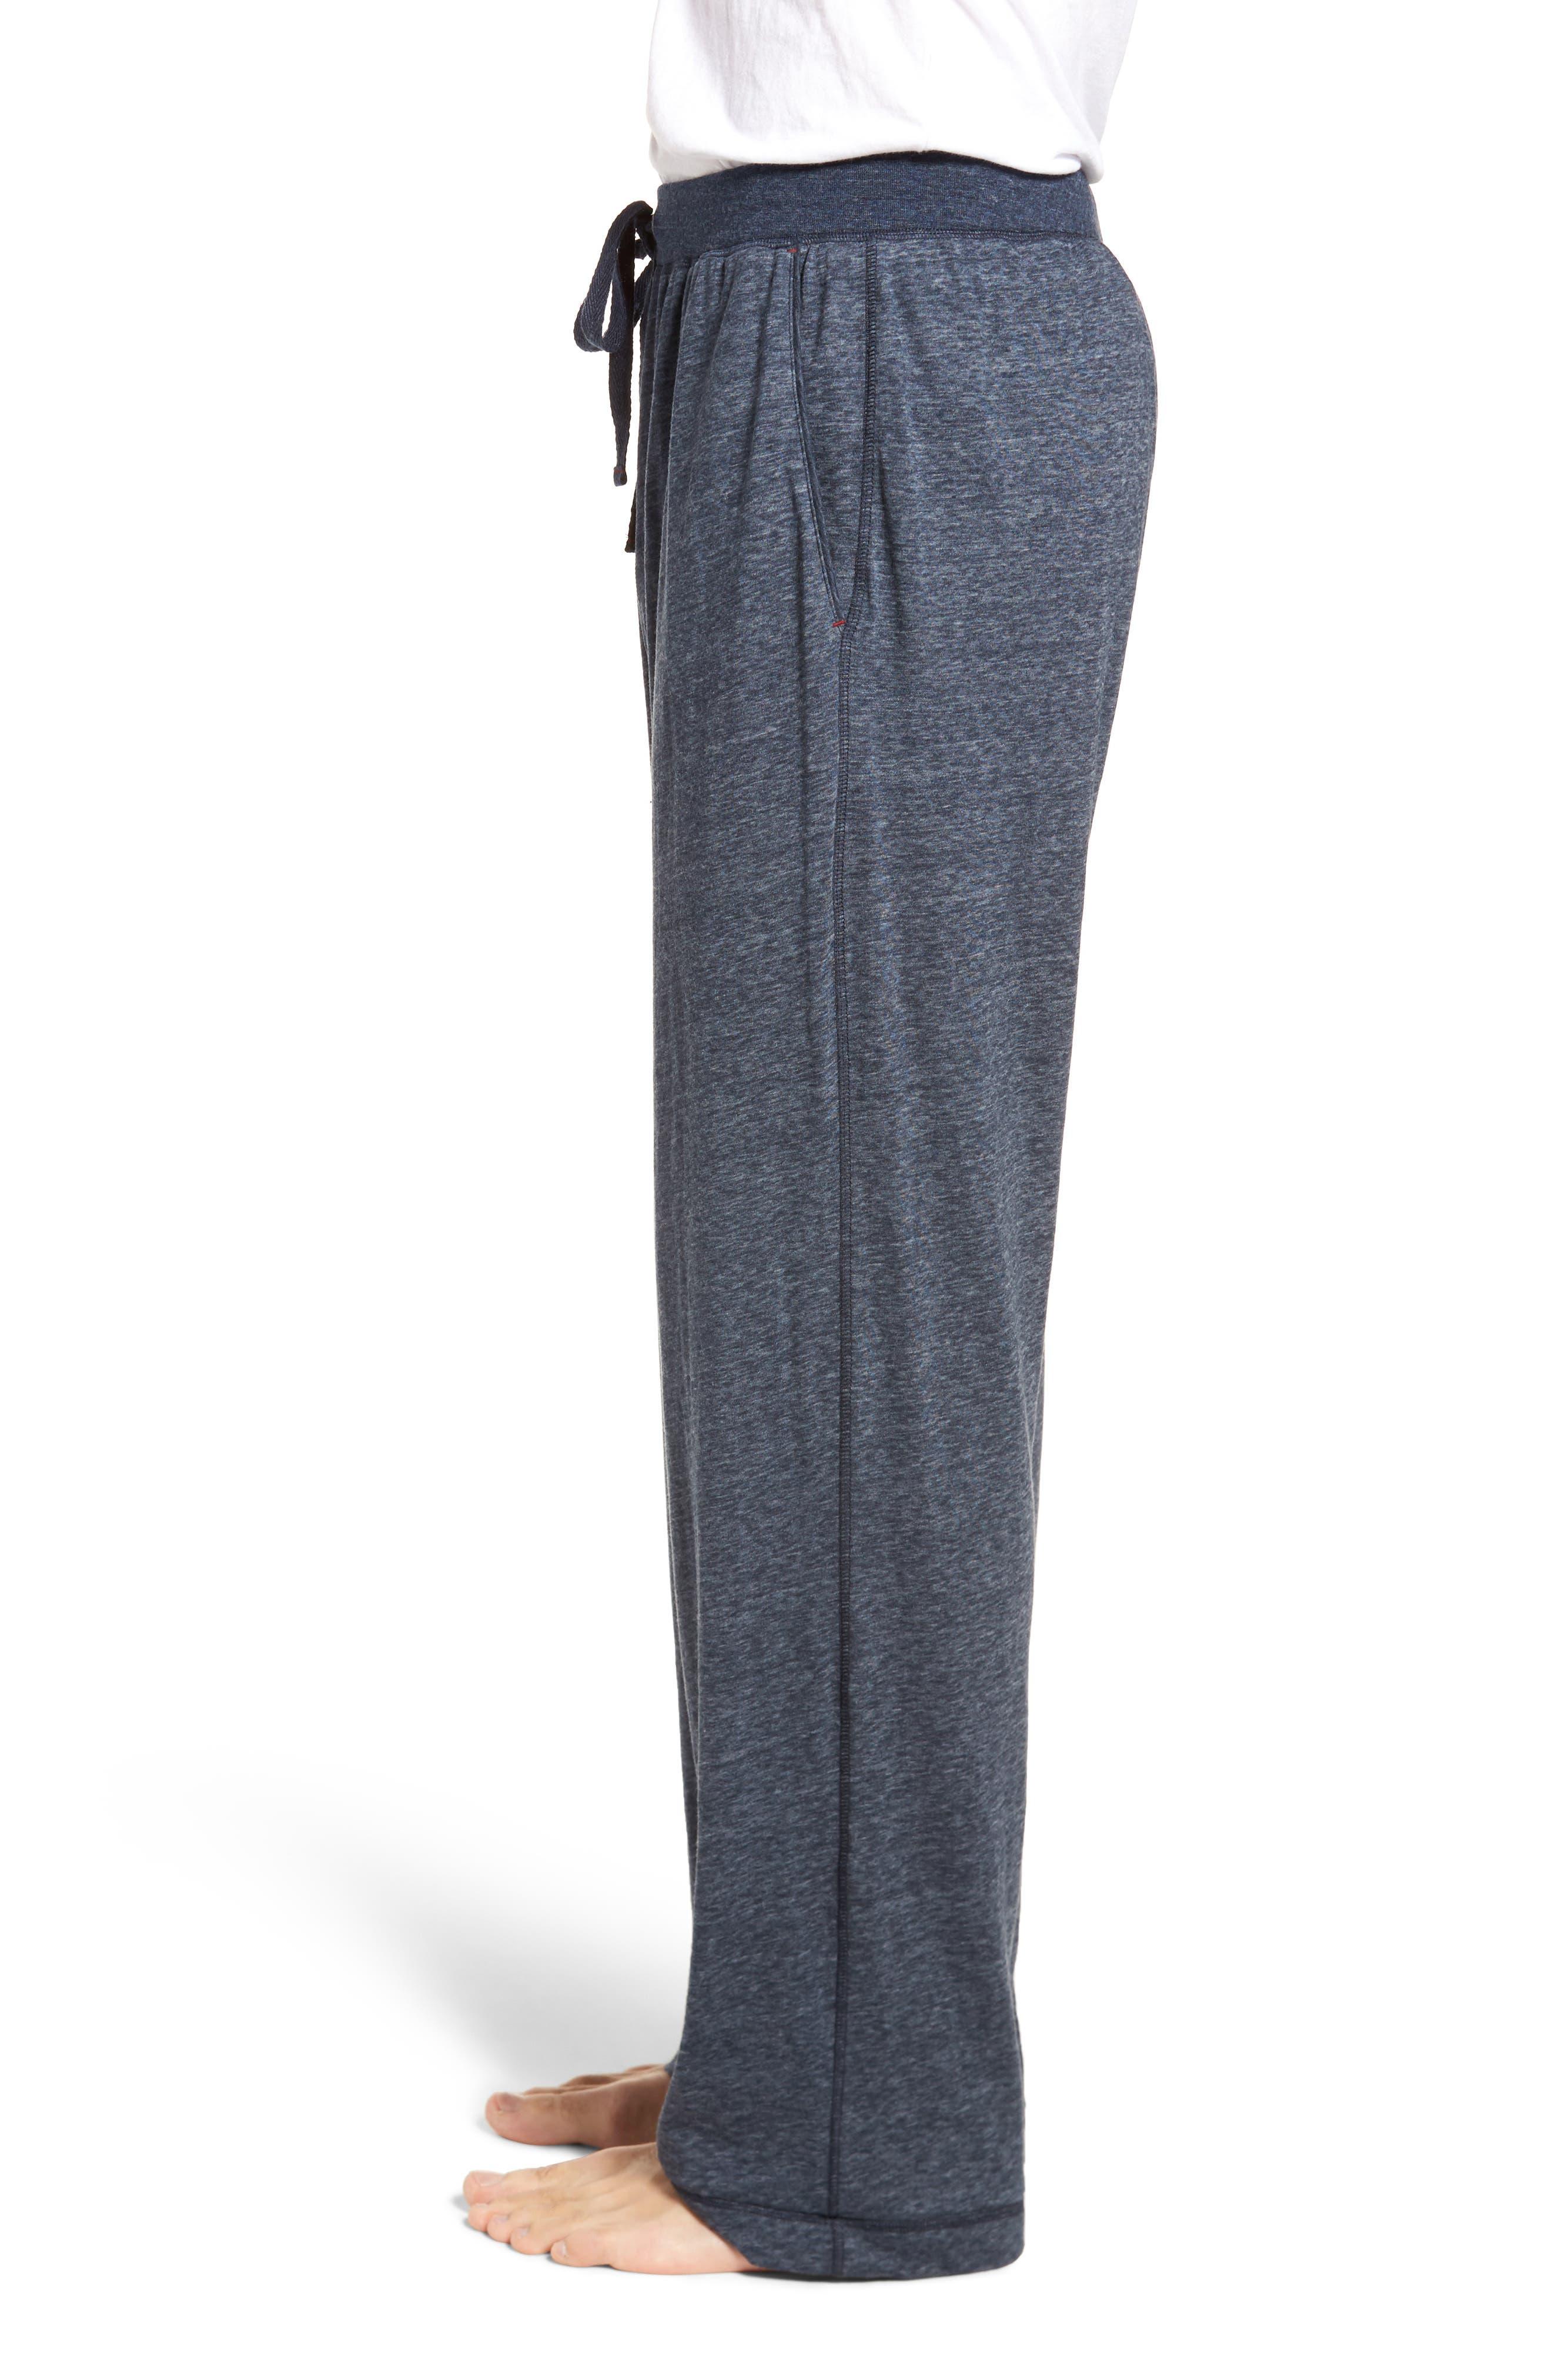 Alternate Image 3  - Daniel Buchler Recycled Cotton Blend Lounge Pants